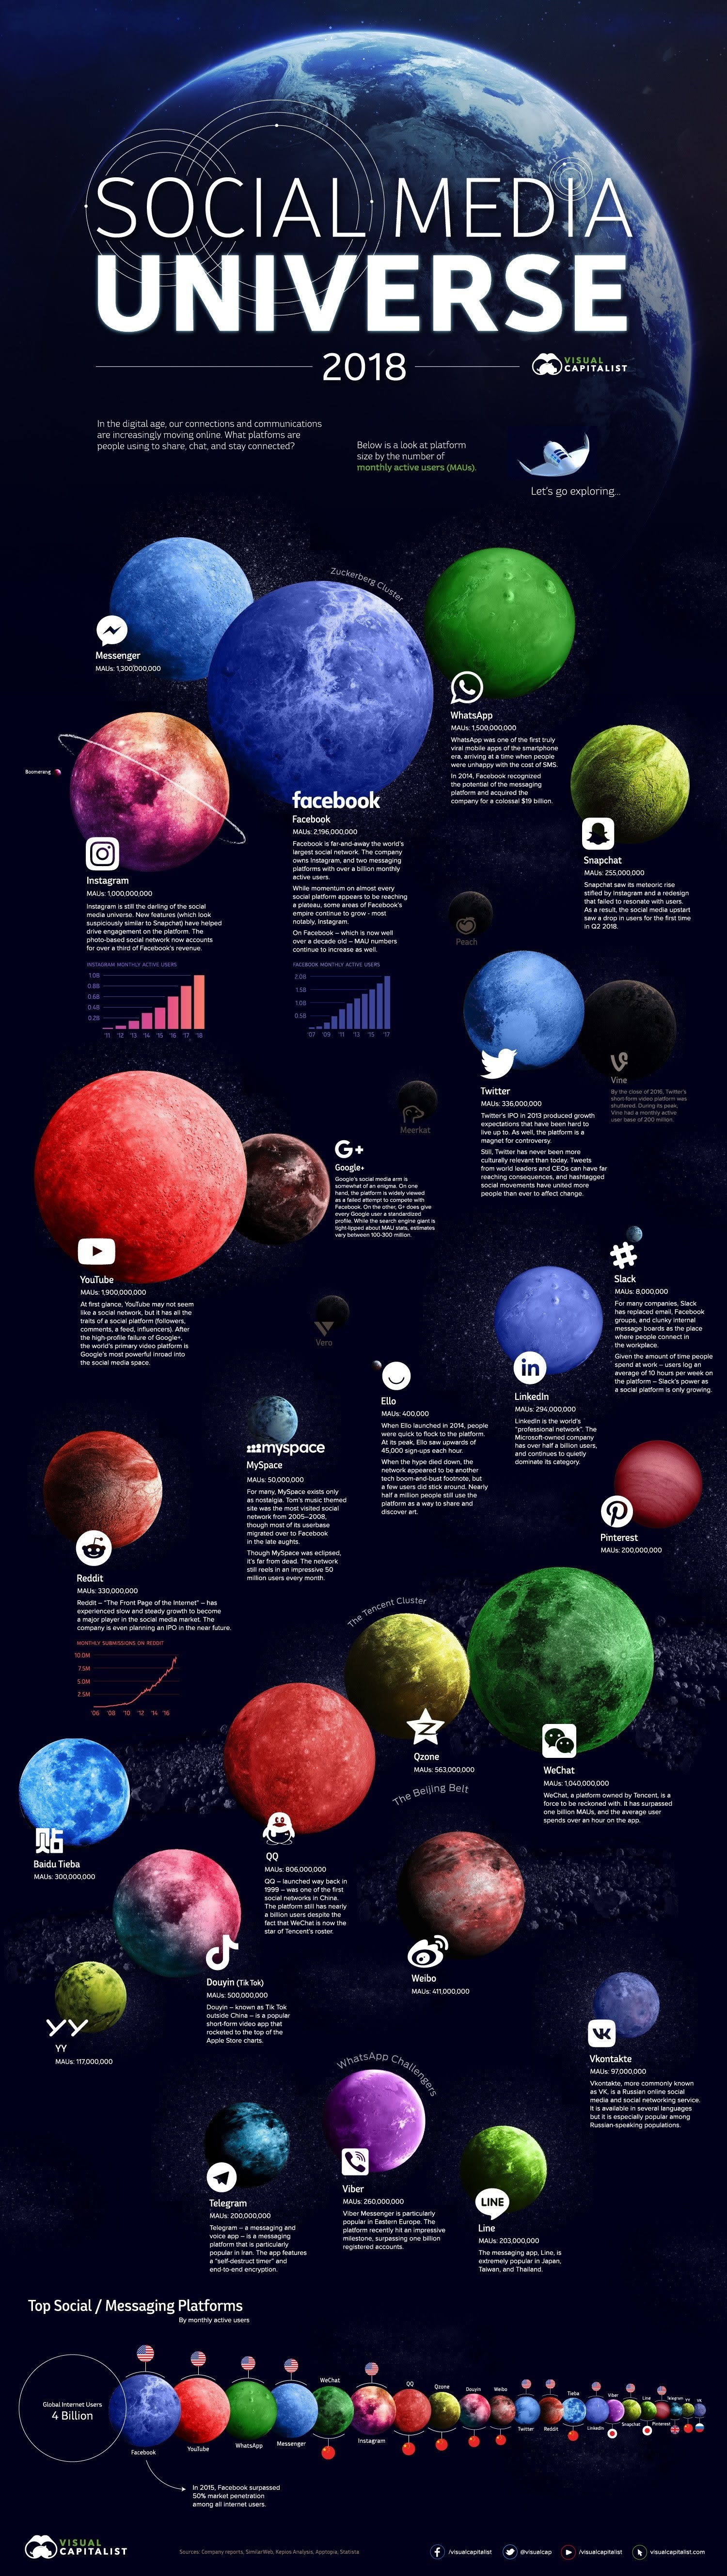 Facebook, Instagram, Whatsapp, YouTube, Linkedin, Reddit, QQ, Twitter, Pinterest: Visualizing the Social Media Universe in 2018 (infographic)